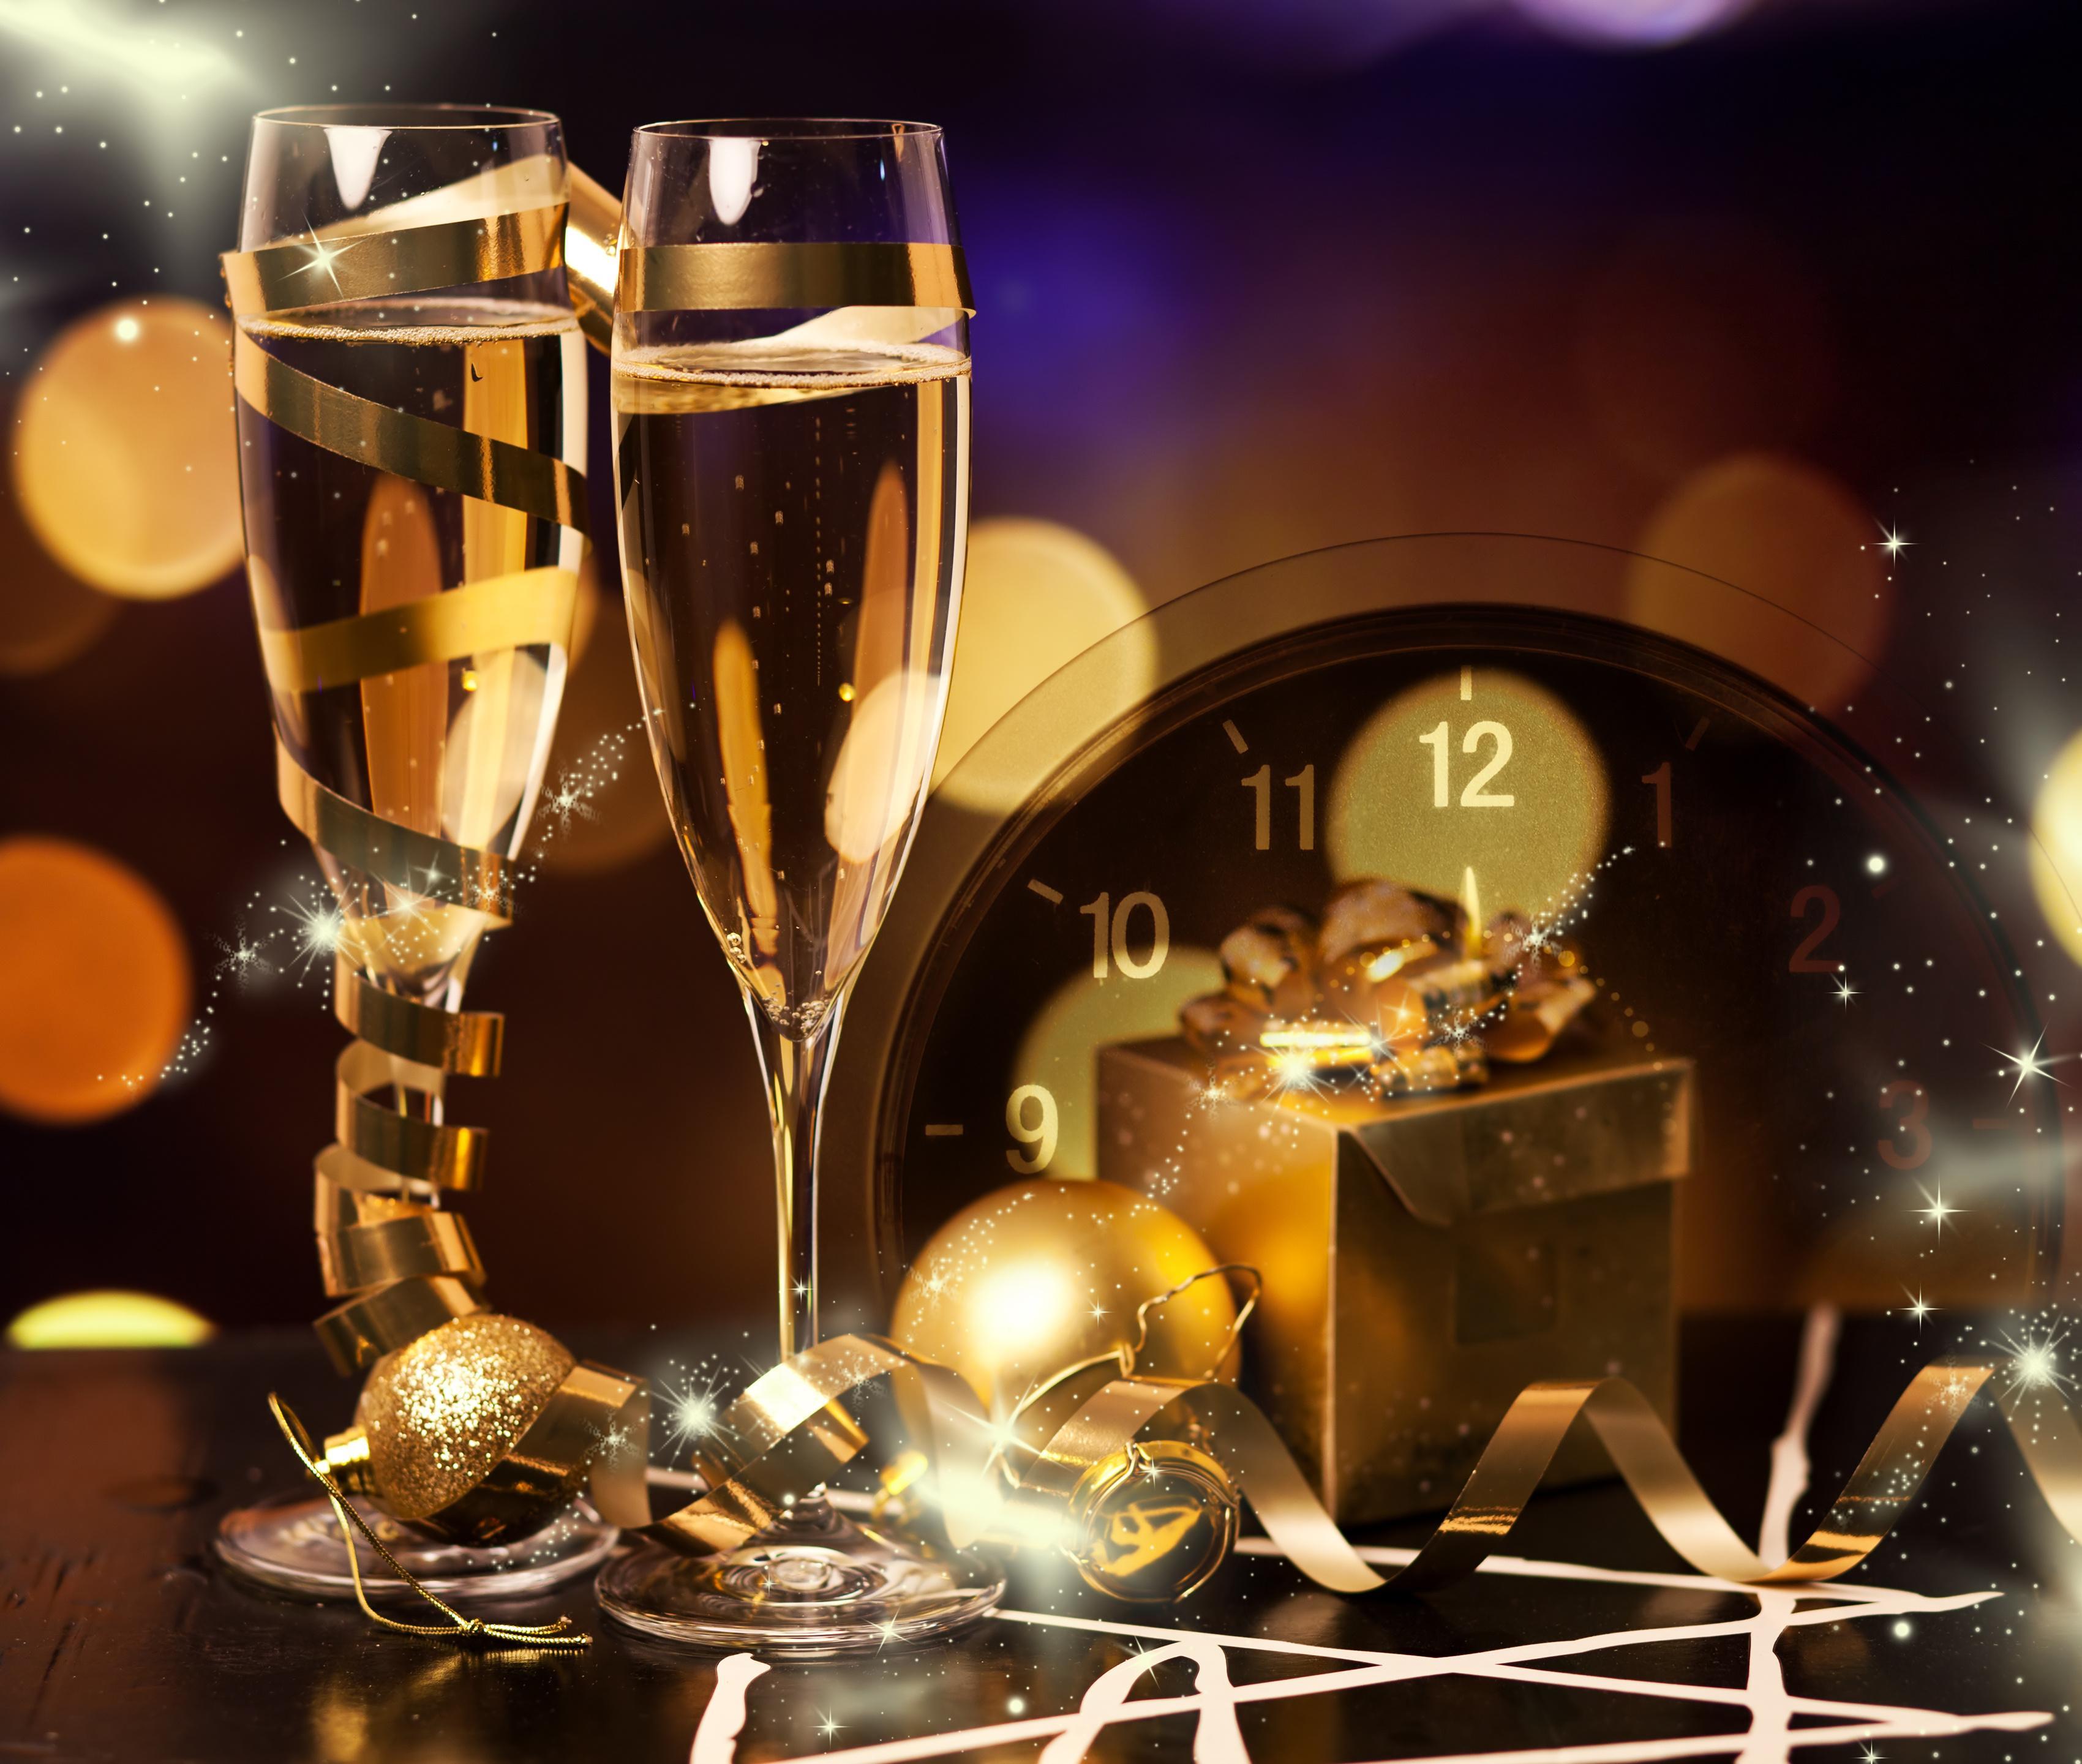 Новый год картинки со два бокала